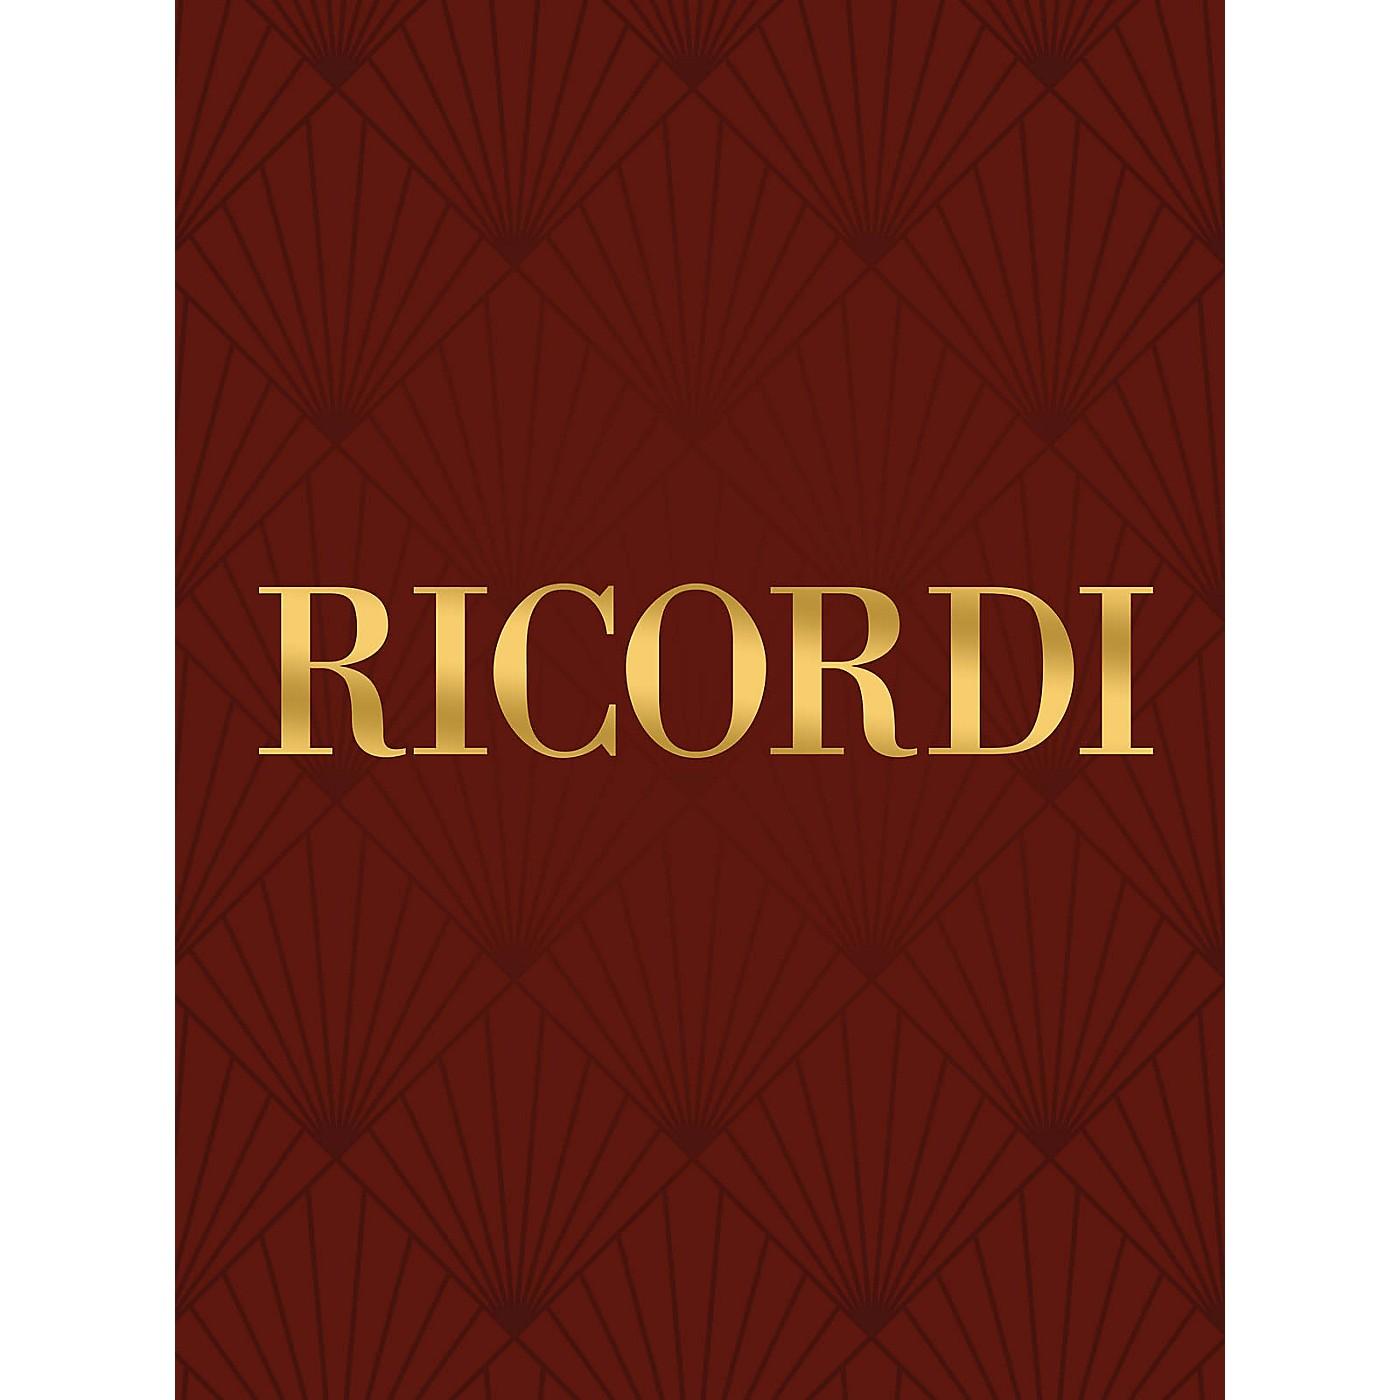 Ricordi Malia Medium, It (Vocal Solo) Vocal Solo Series Composed by Francesco Paolo Tosti thumbnail